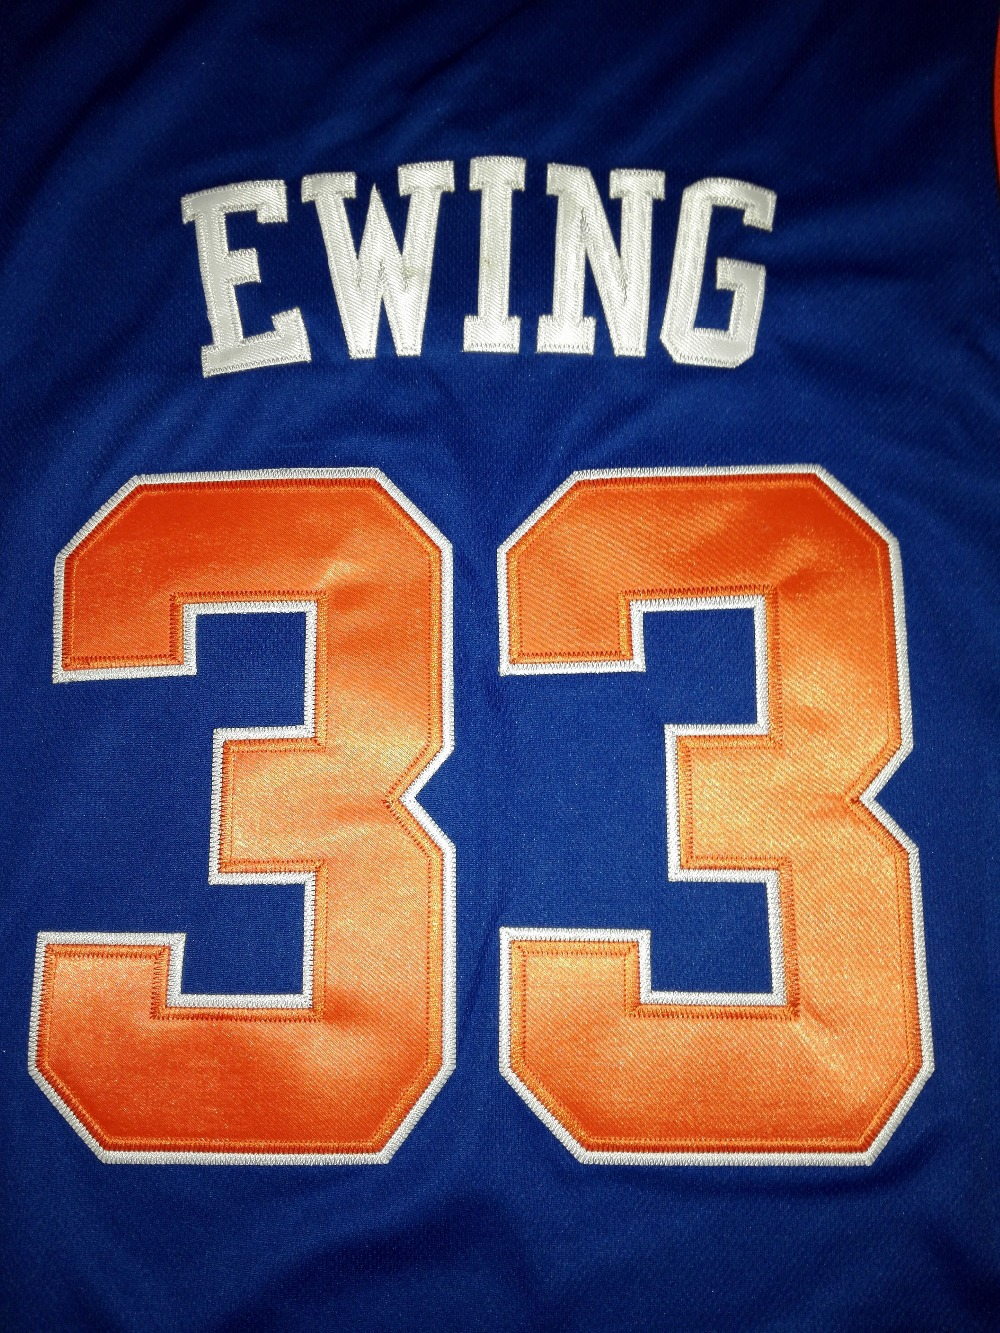 95c59b20fa2 ... NEW YORK BASKETBALL Shirt JERSEY 33 Patrick Ewing 8 LATRELL SPREWELL 3  John Starks Embroidery Stitched ...